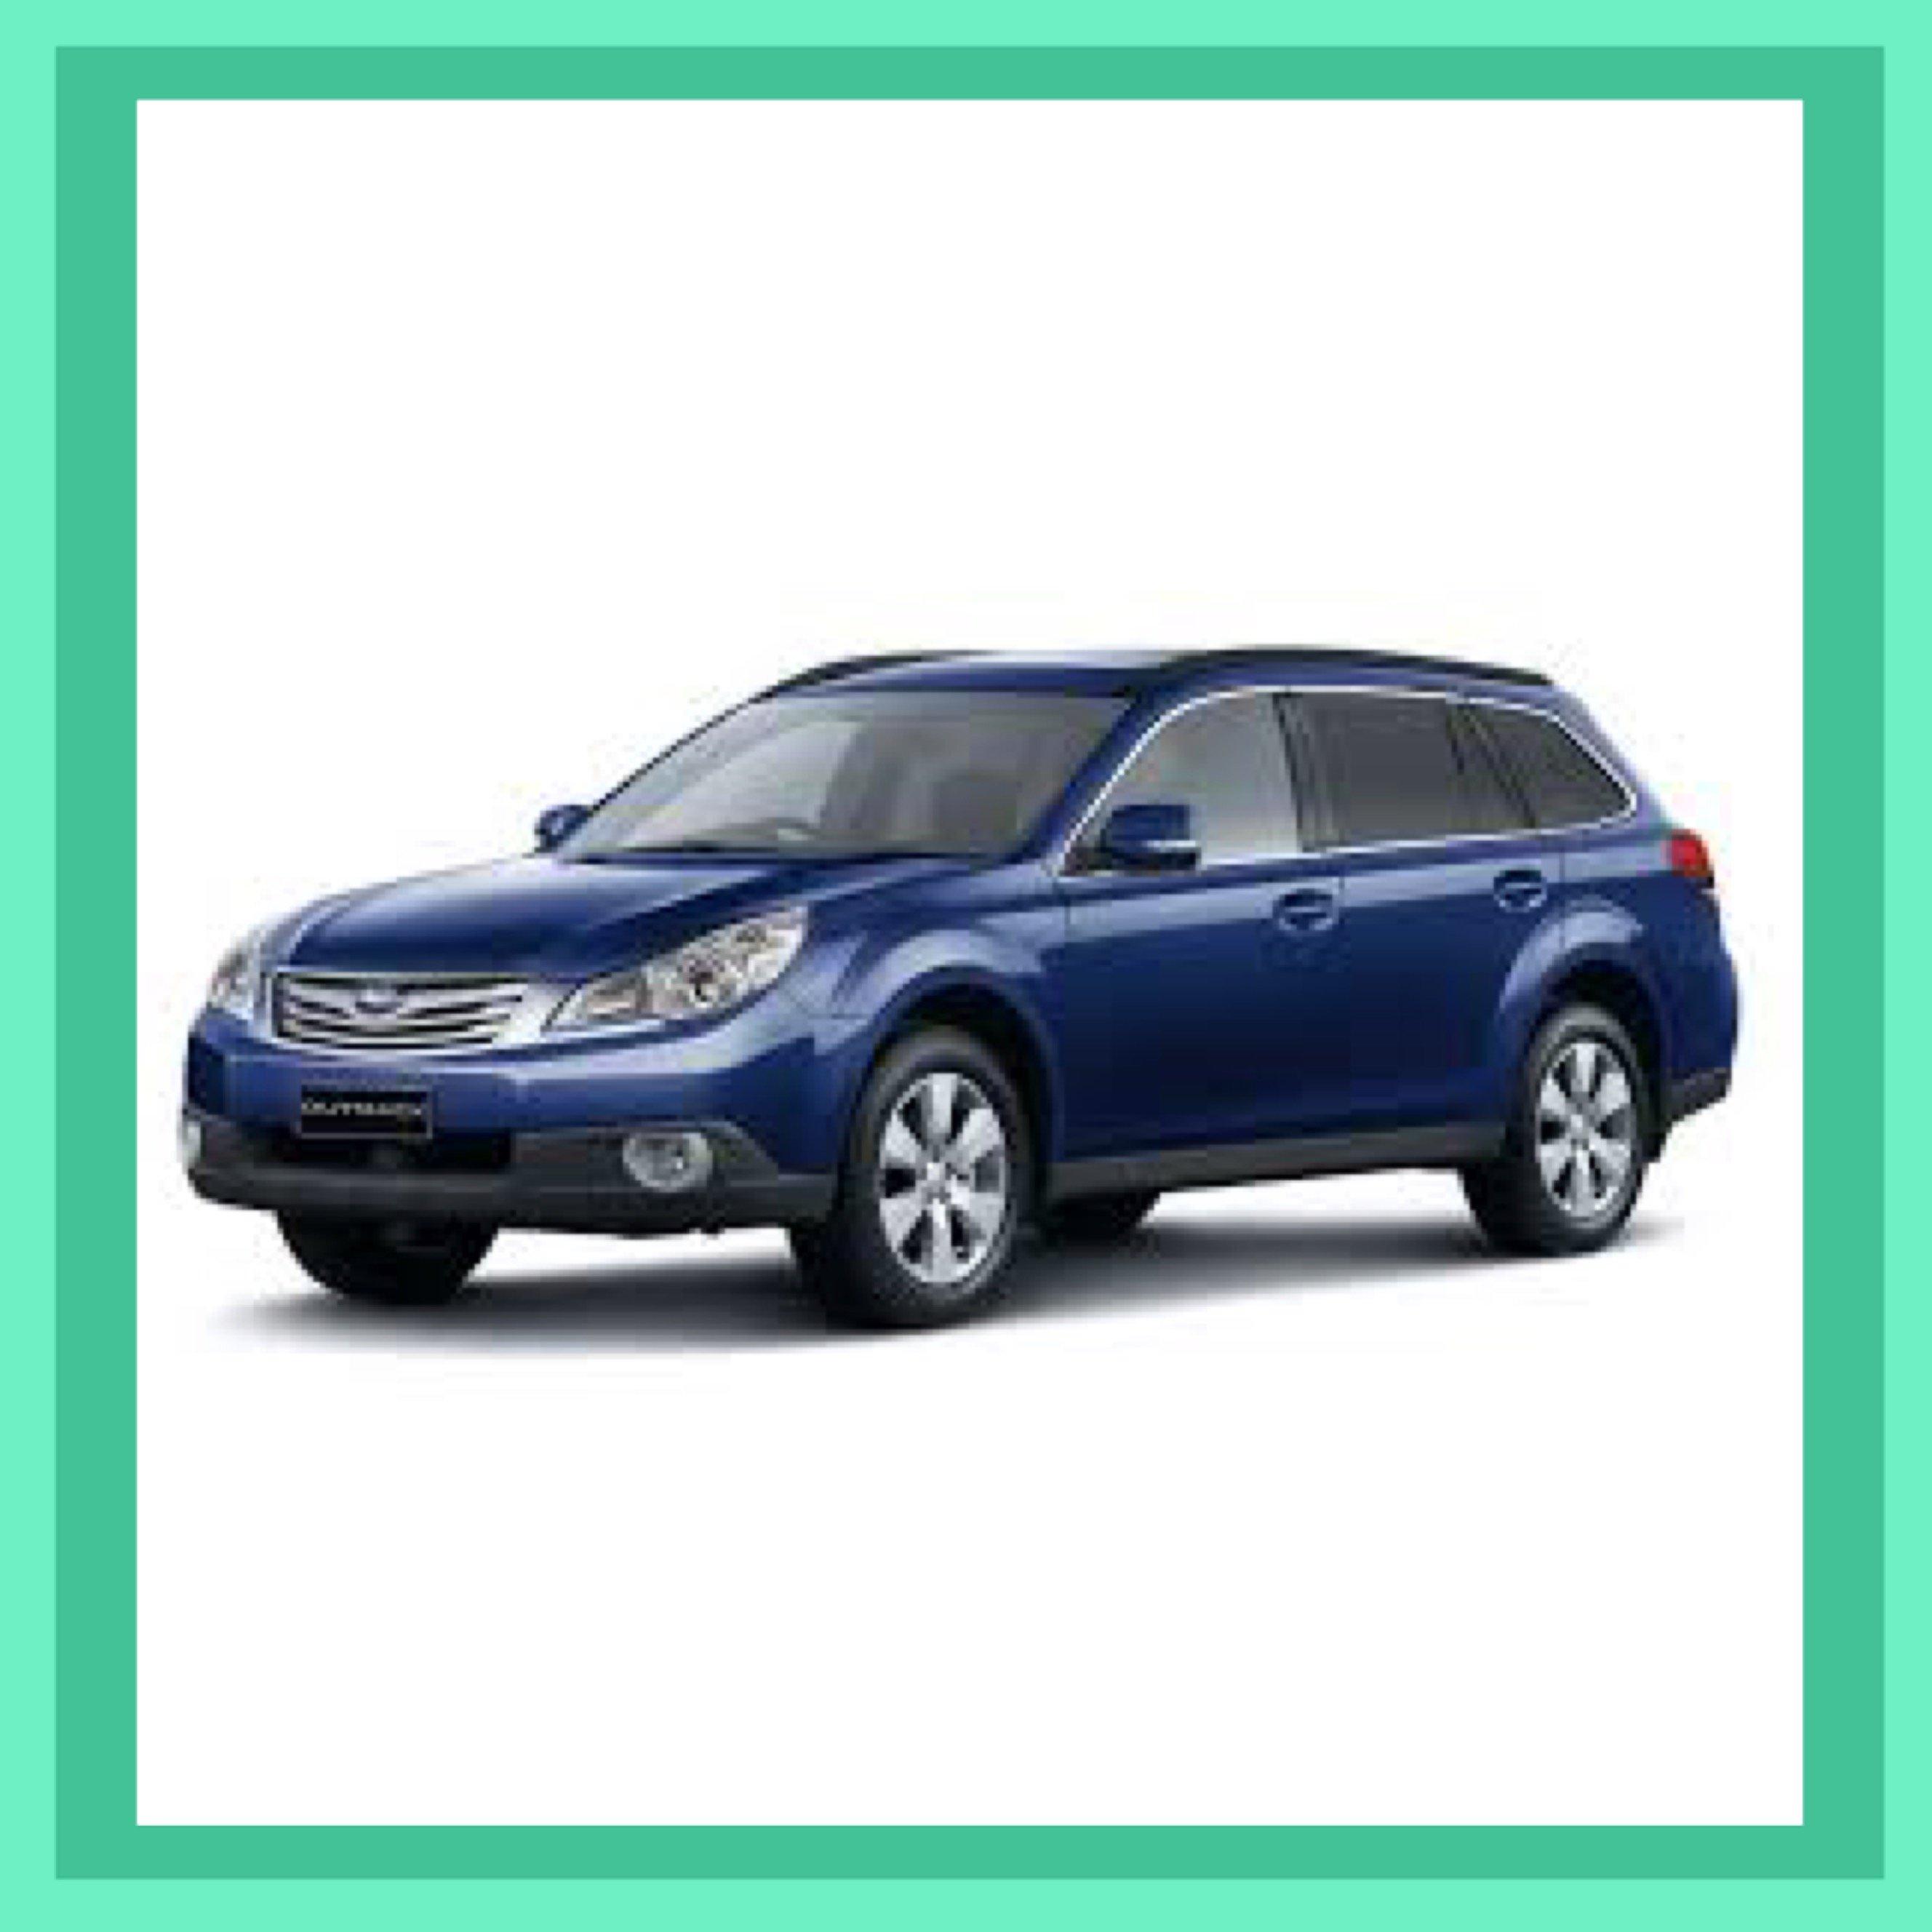 Subaru Outback 5th Gen 2009-2013